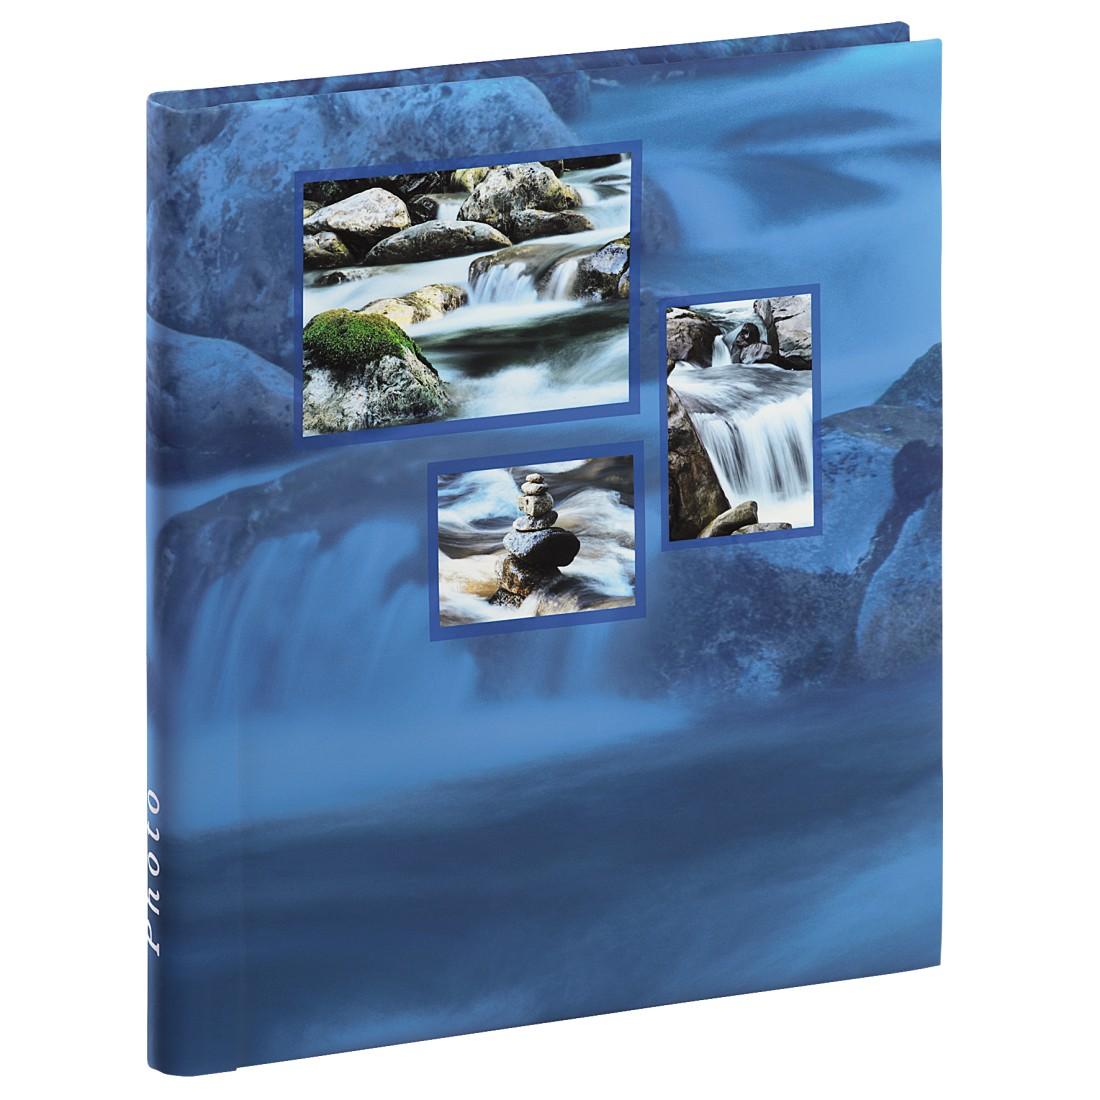 00106267 Hama Singo Self Adhesive Album 28x31 Cm 20 White Pages